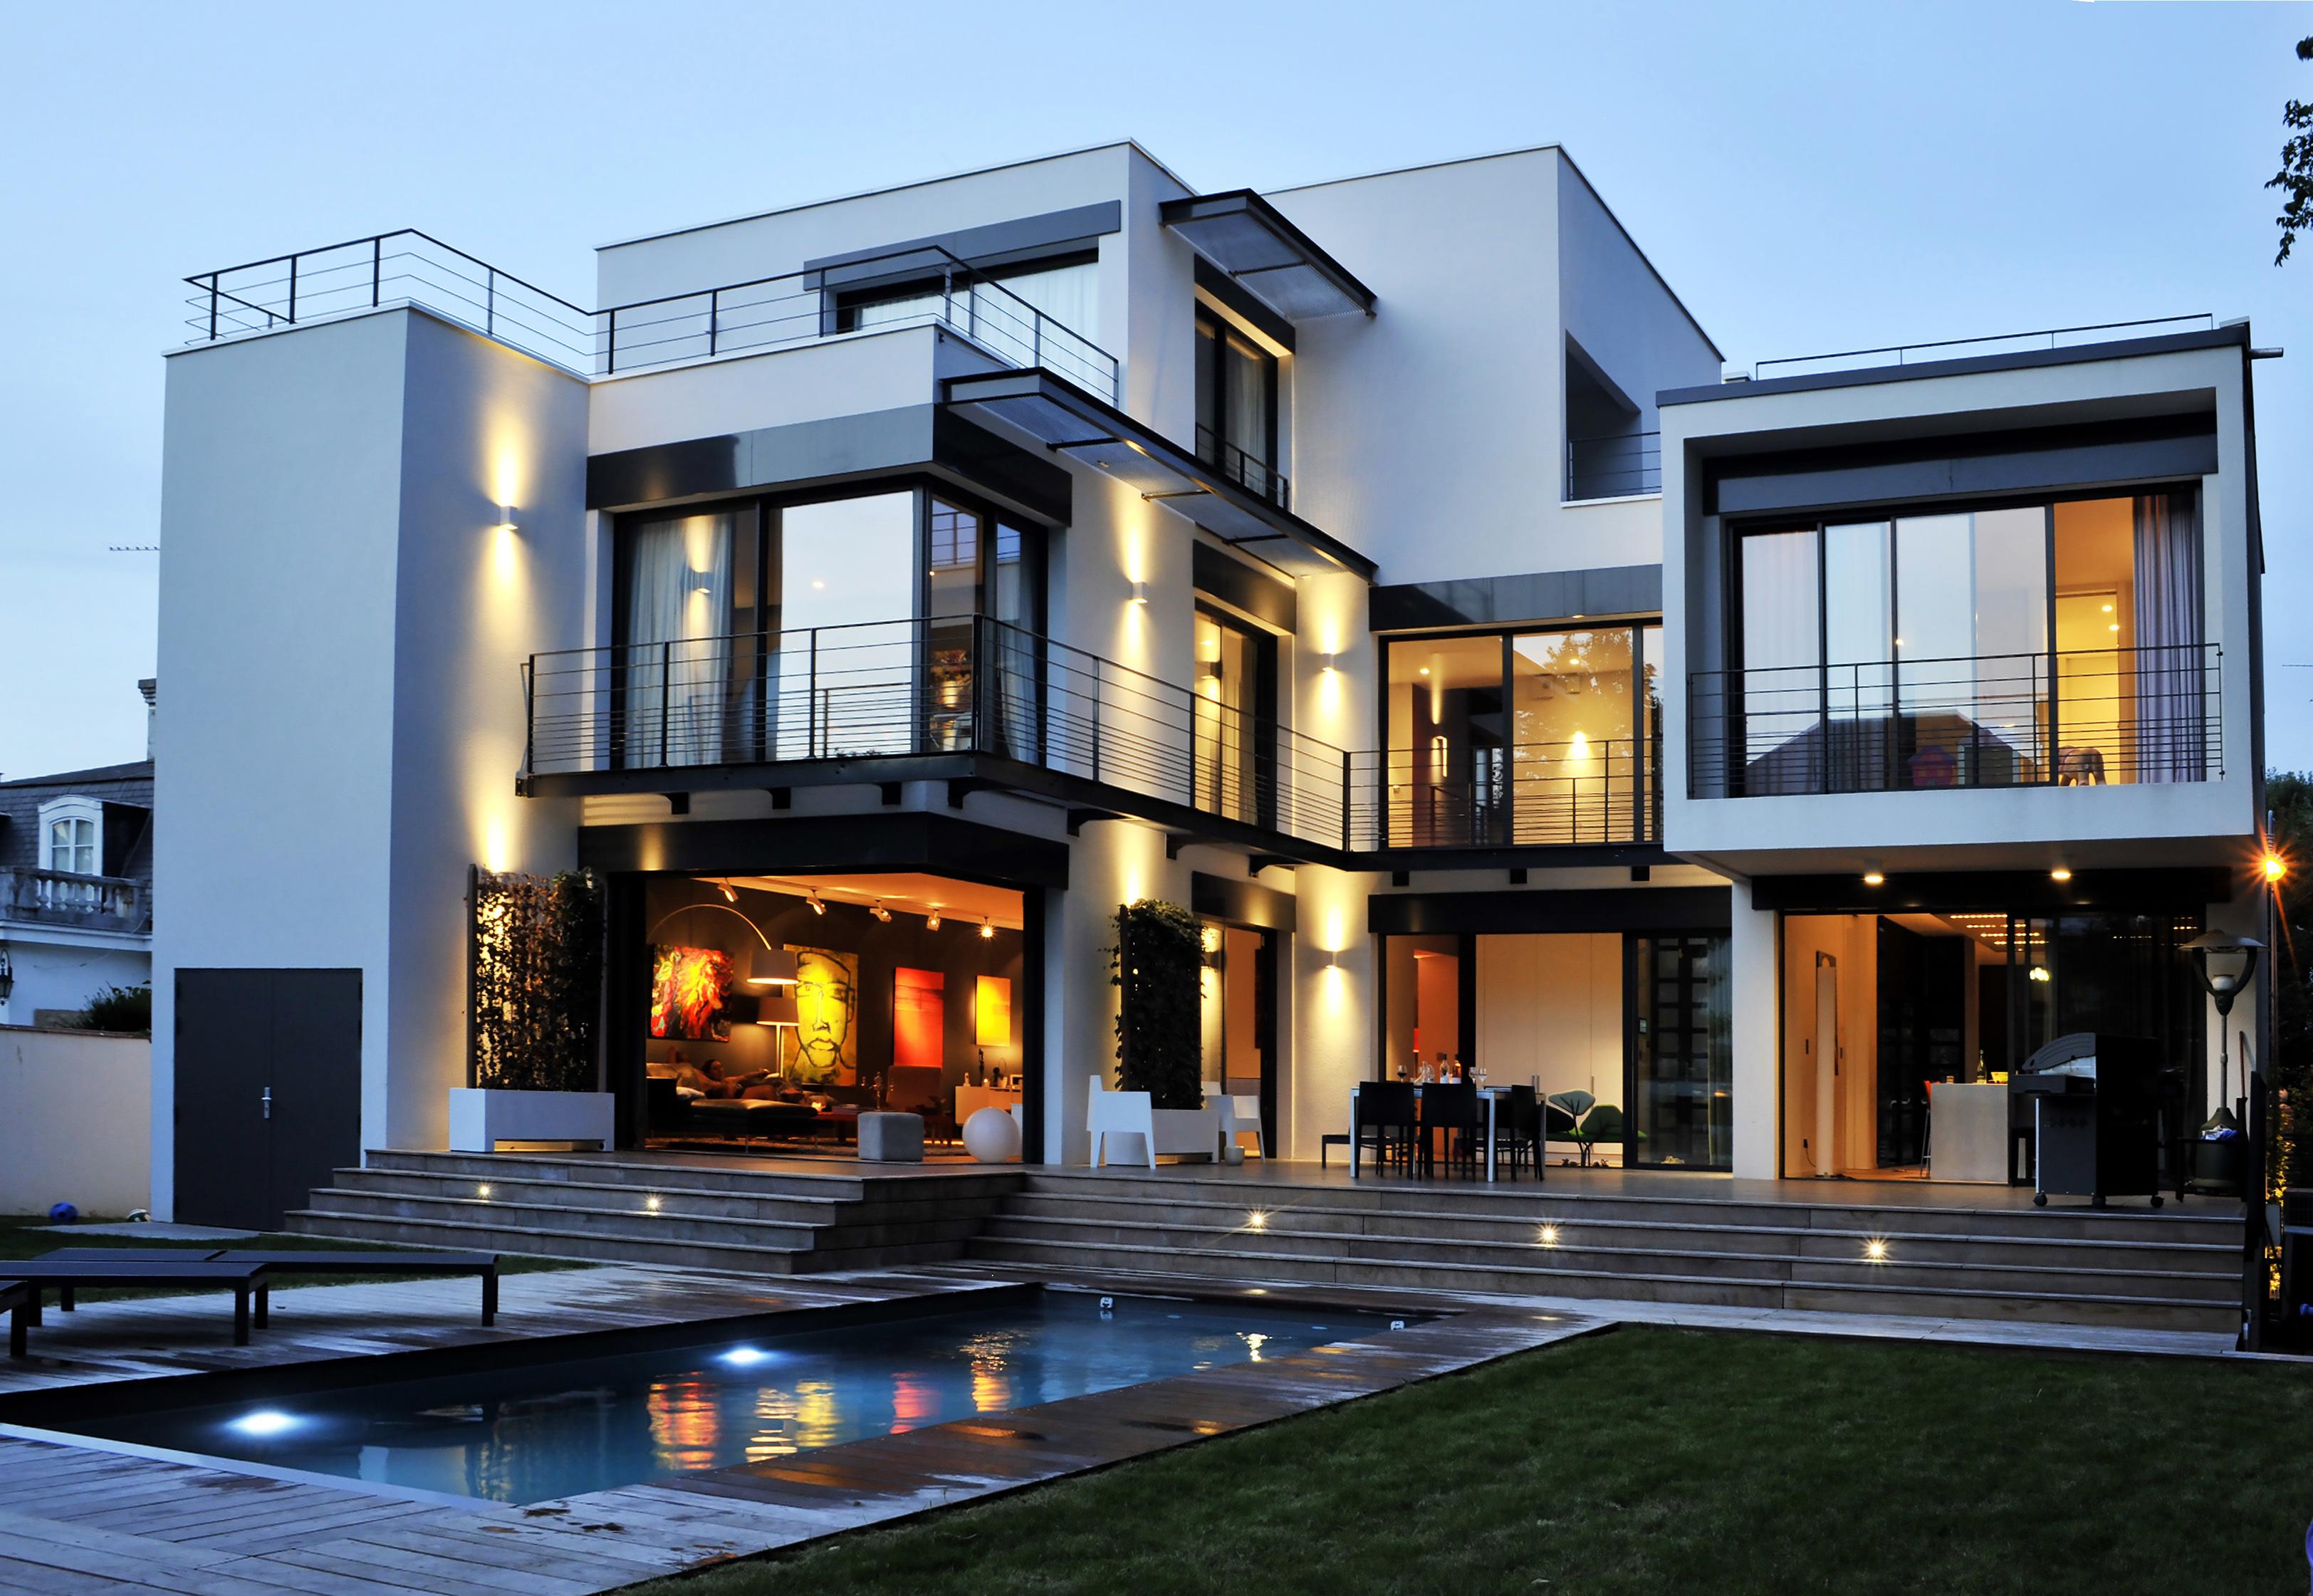 F au immobilier belles demeures for Immo belles demeures